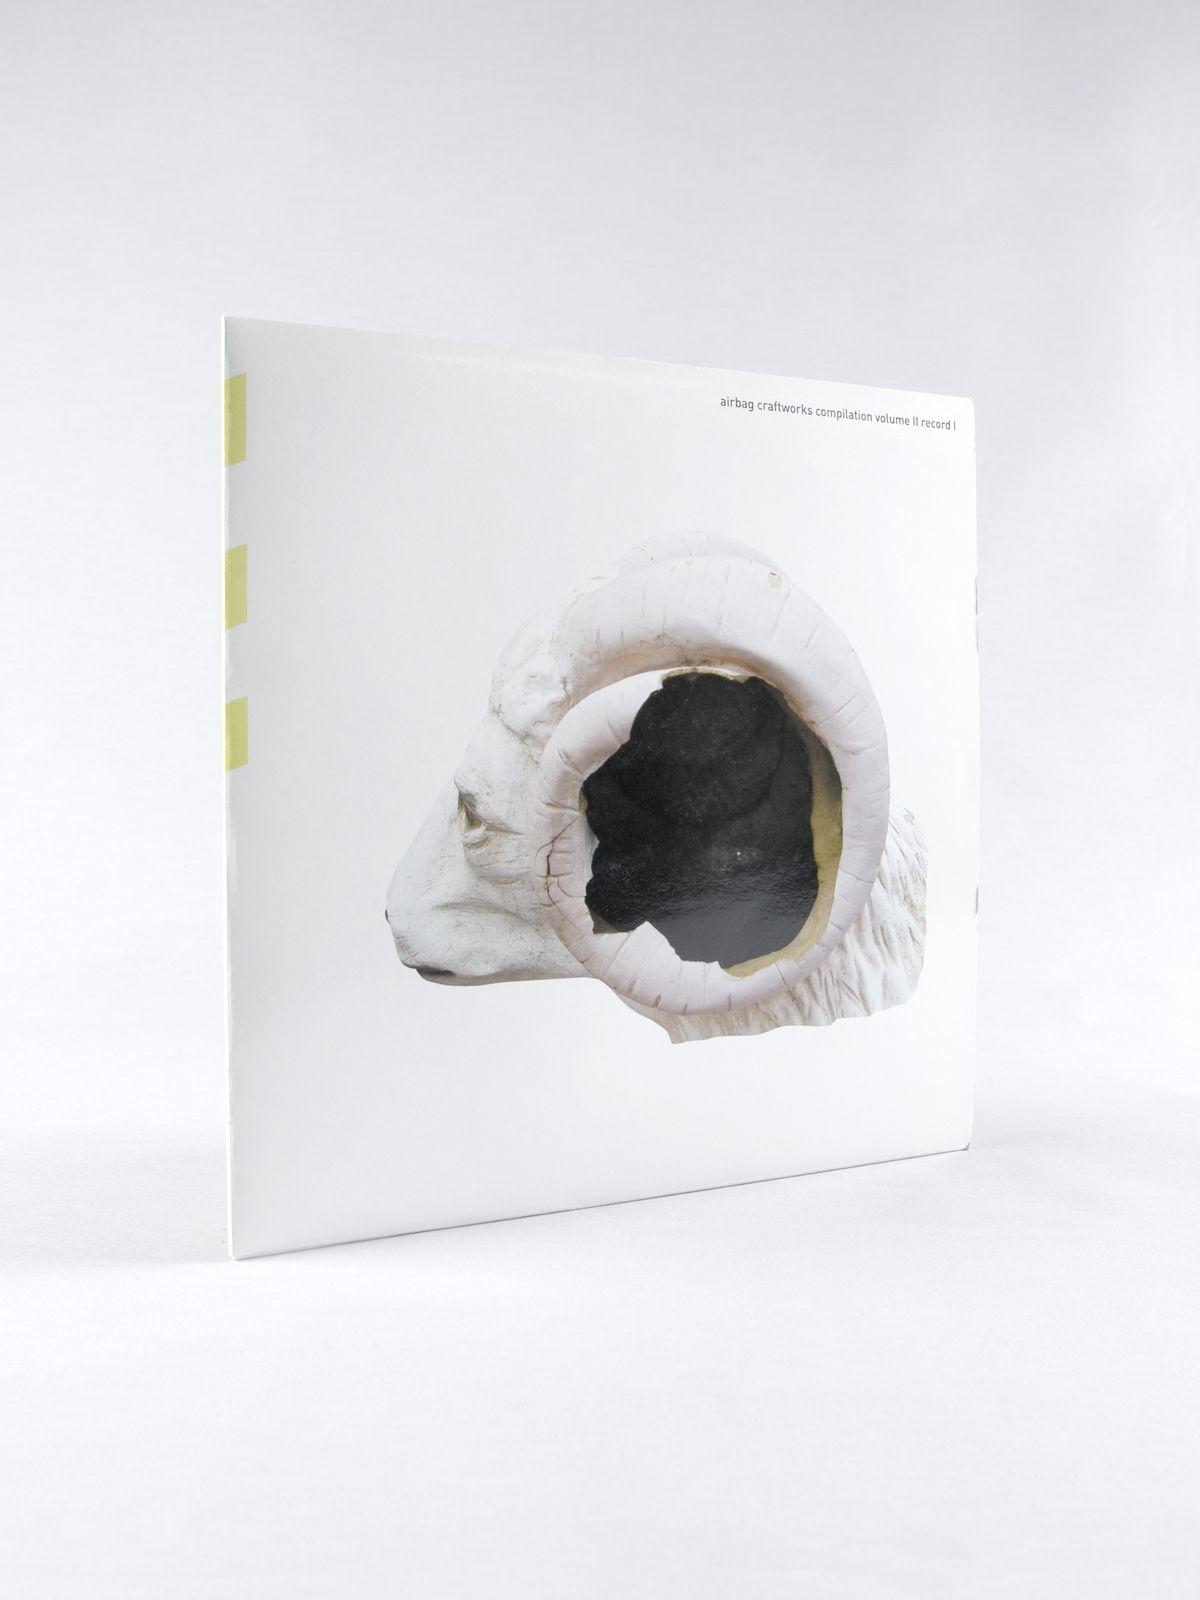 airbag craftworks compilation volume II record I